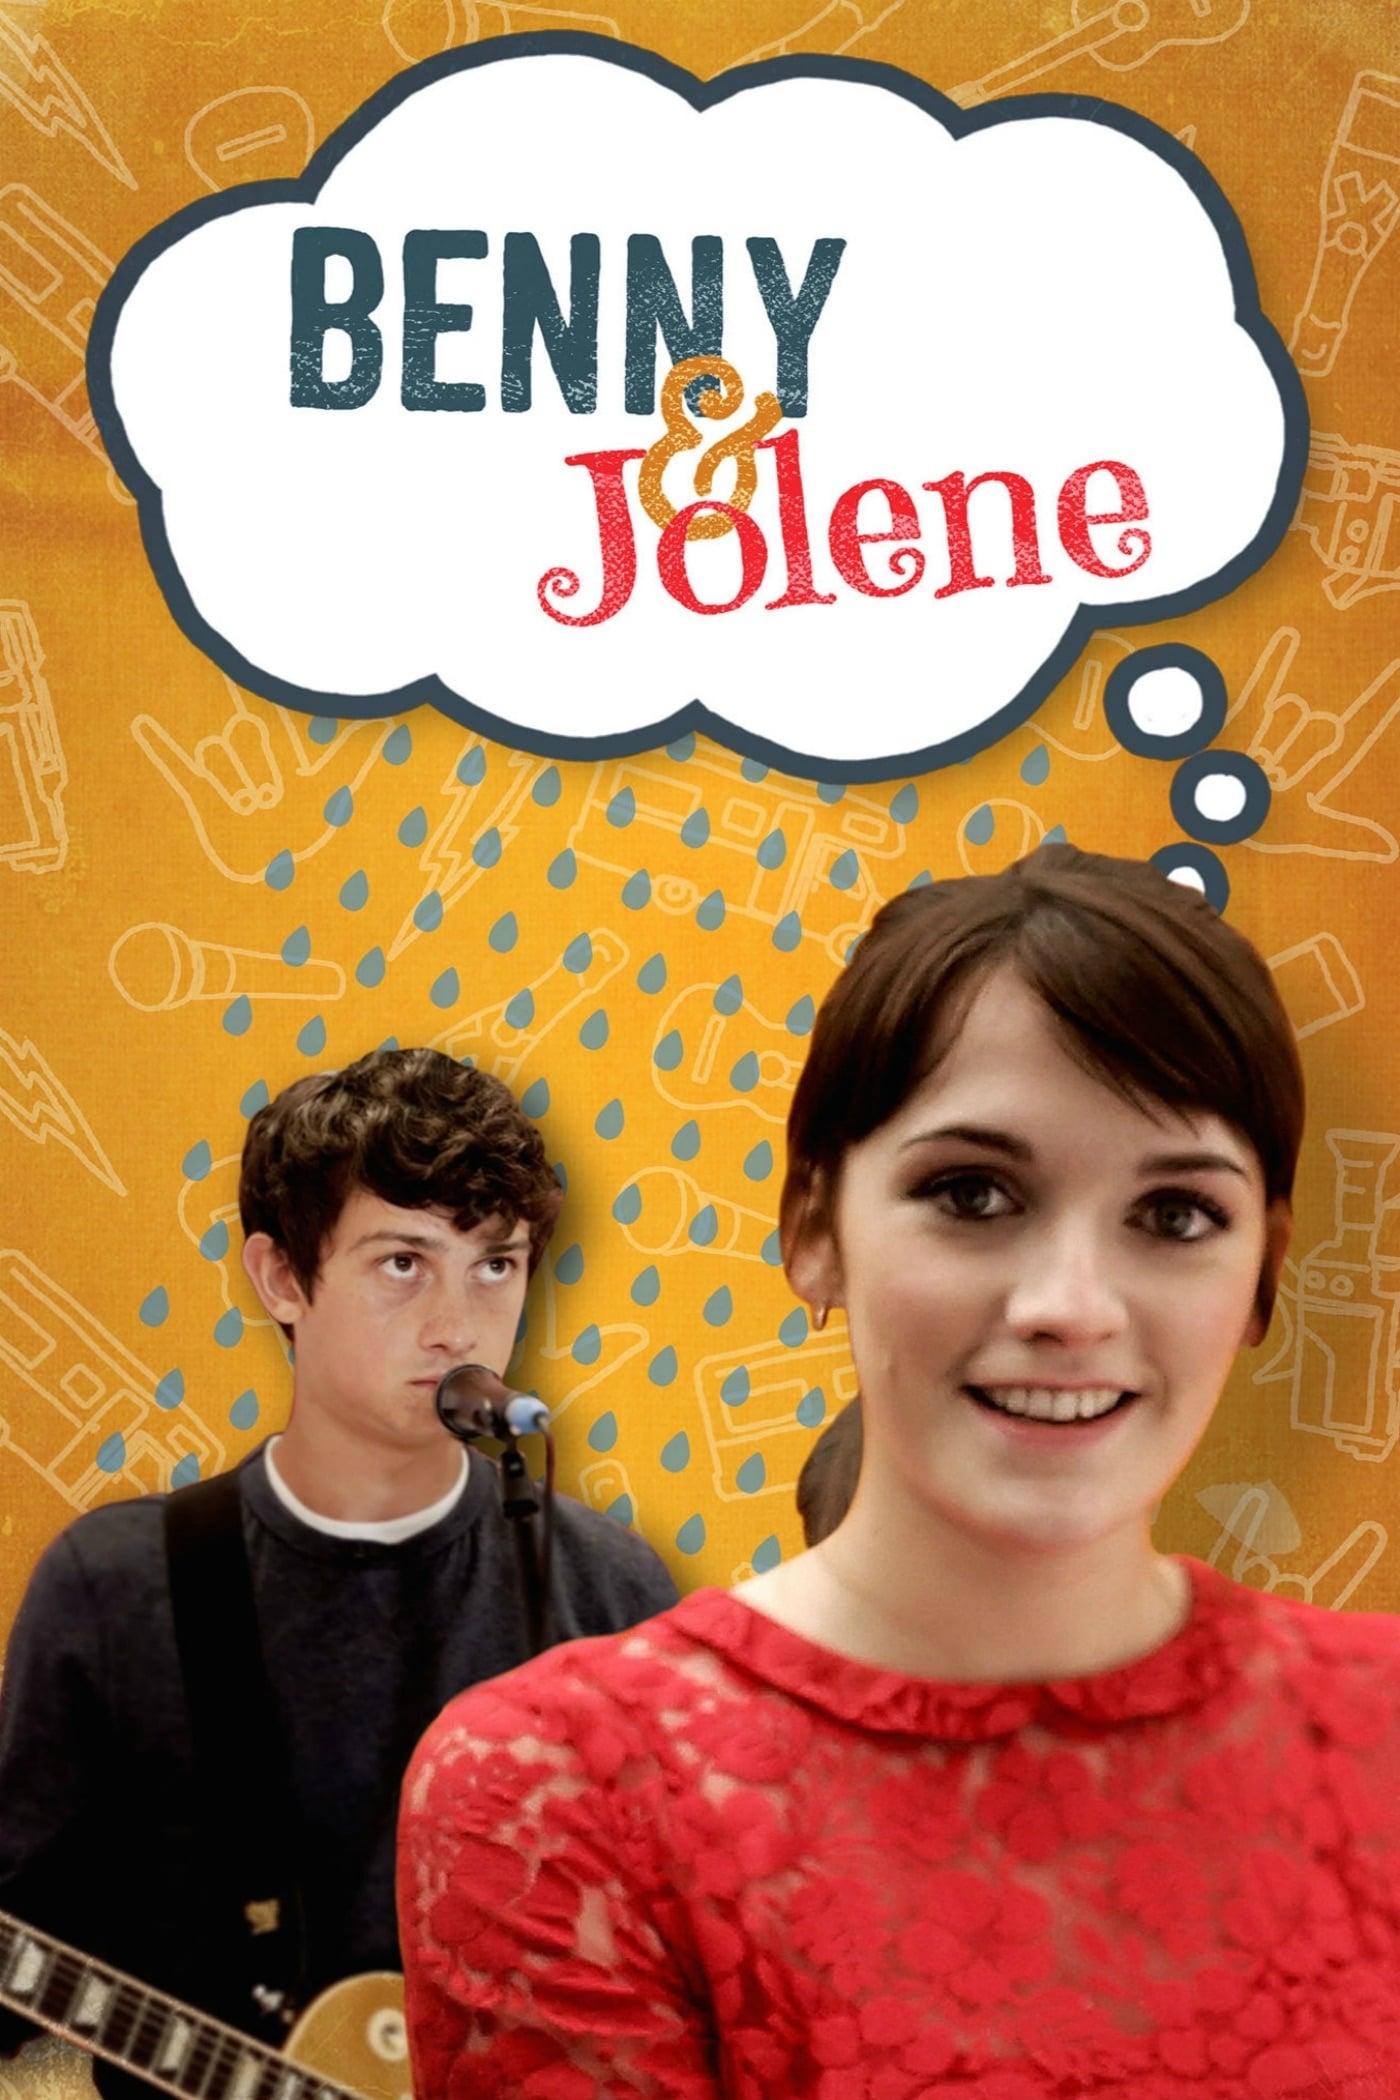 Benny & Jolene